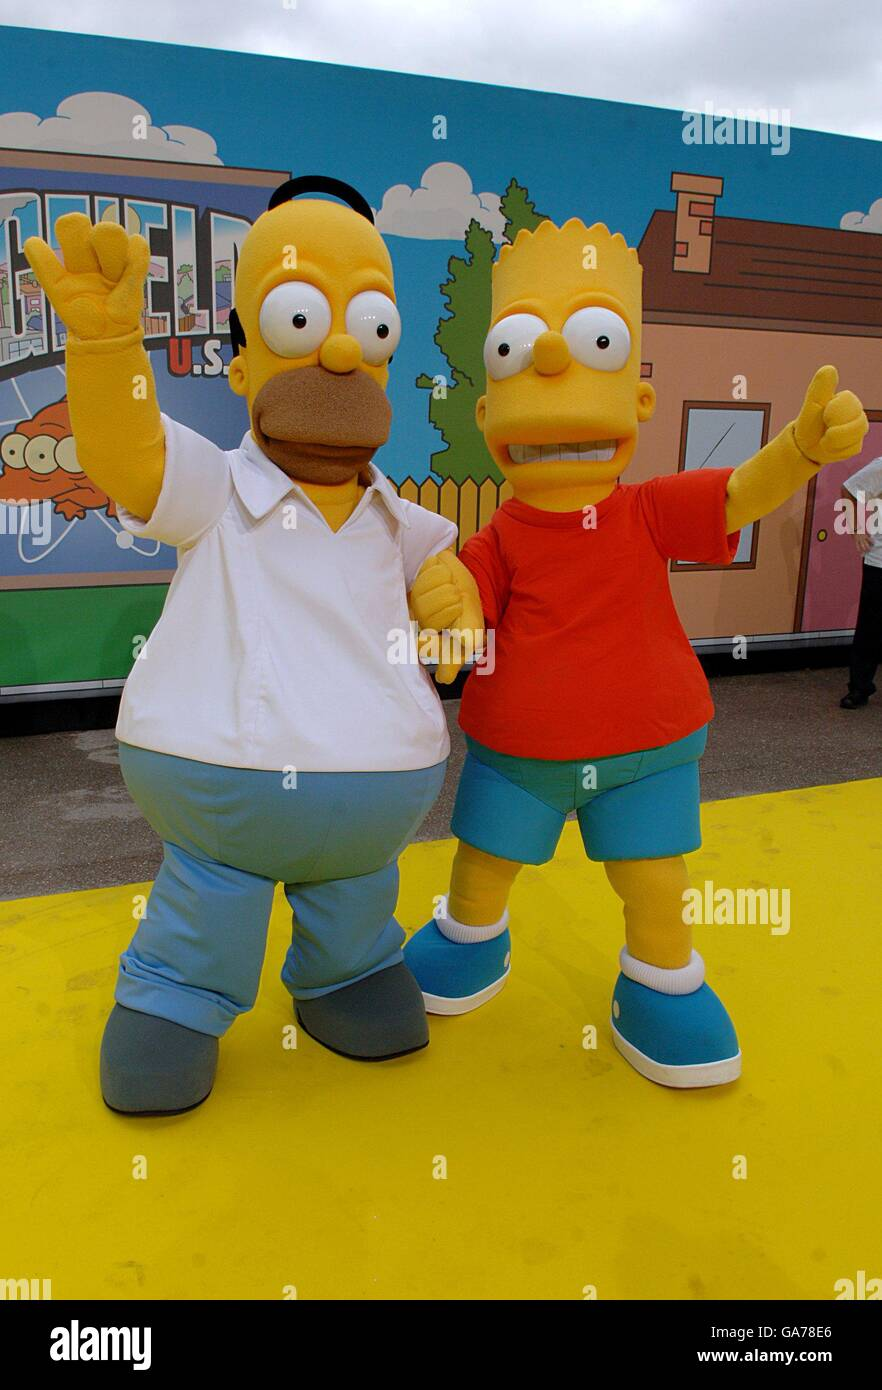 The Simpsons Movie Uk Premiere London Stock Photo Alamy